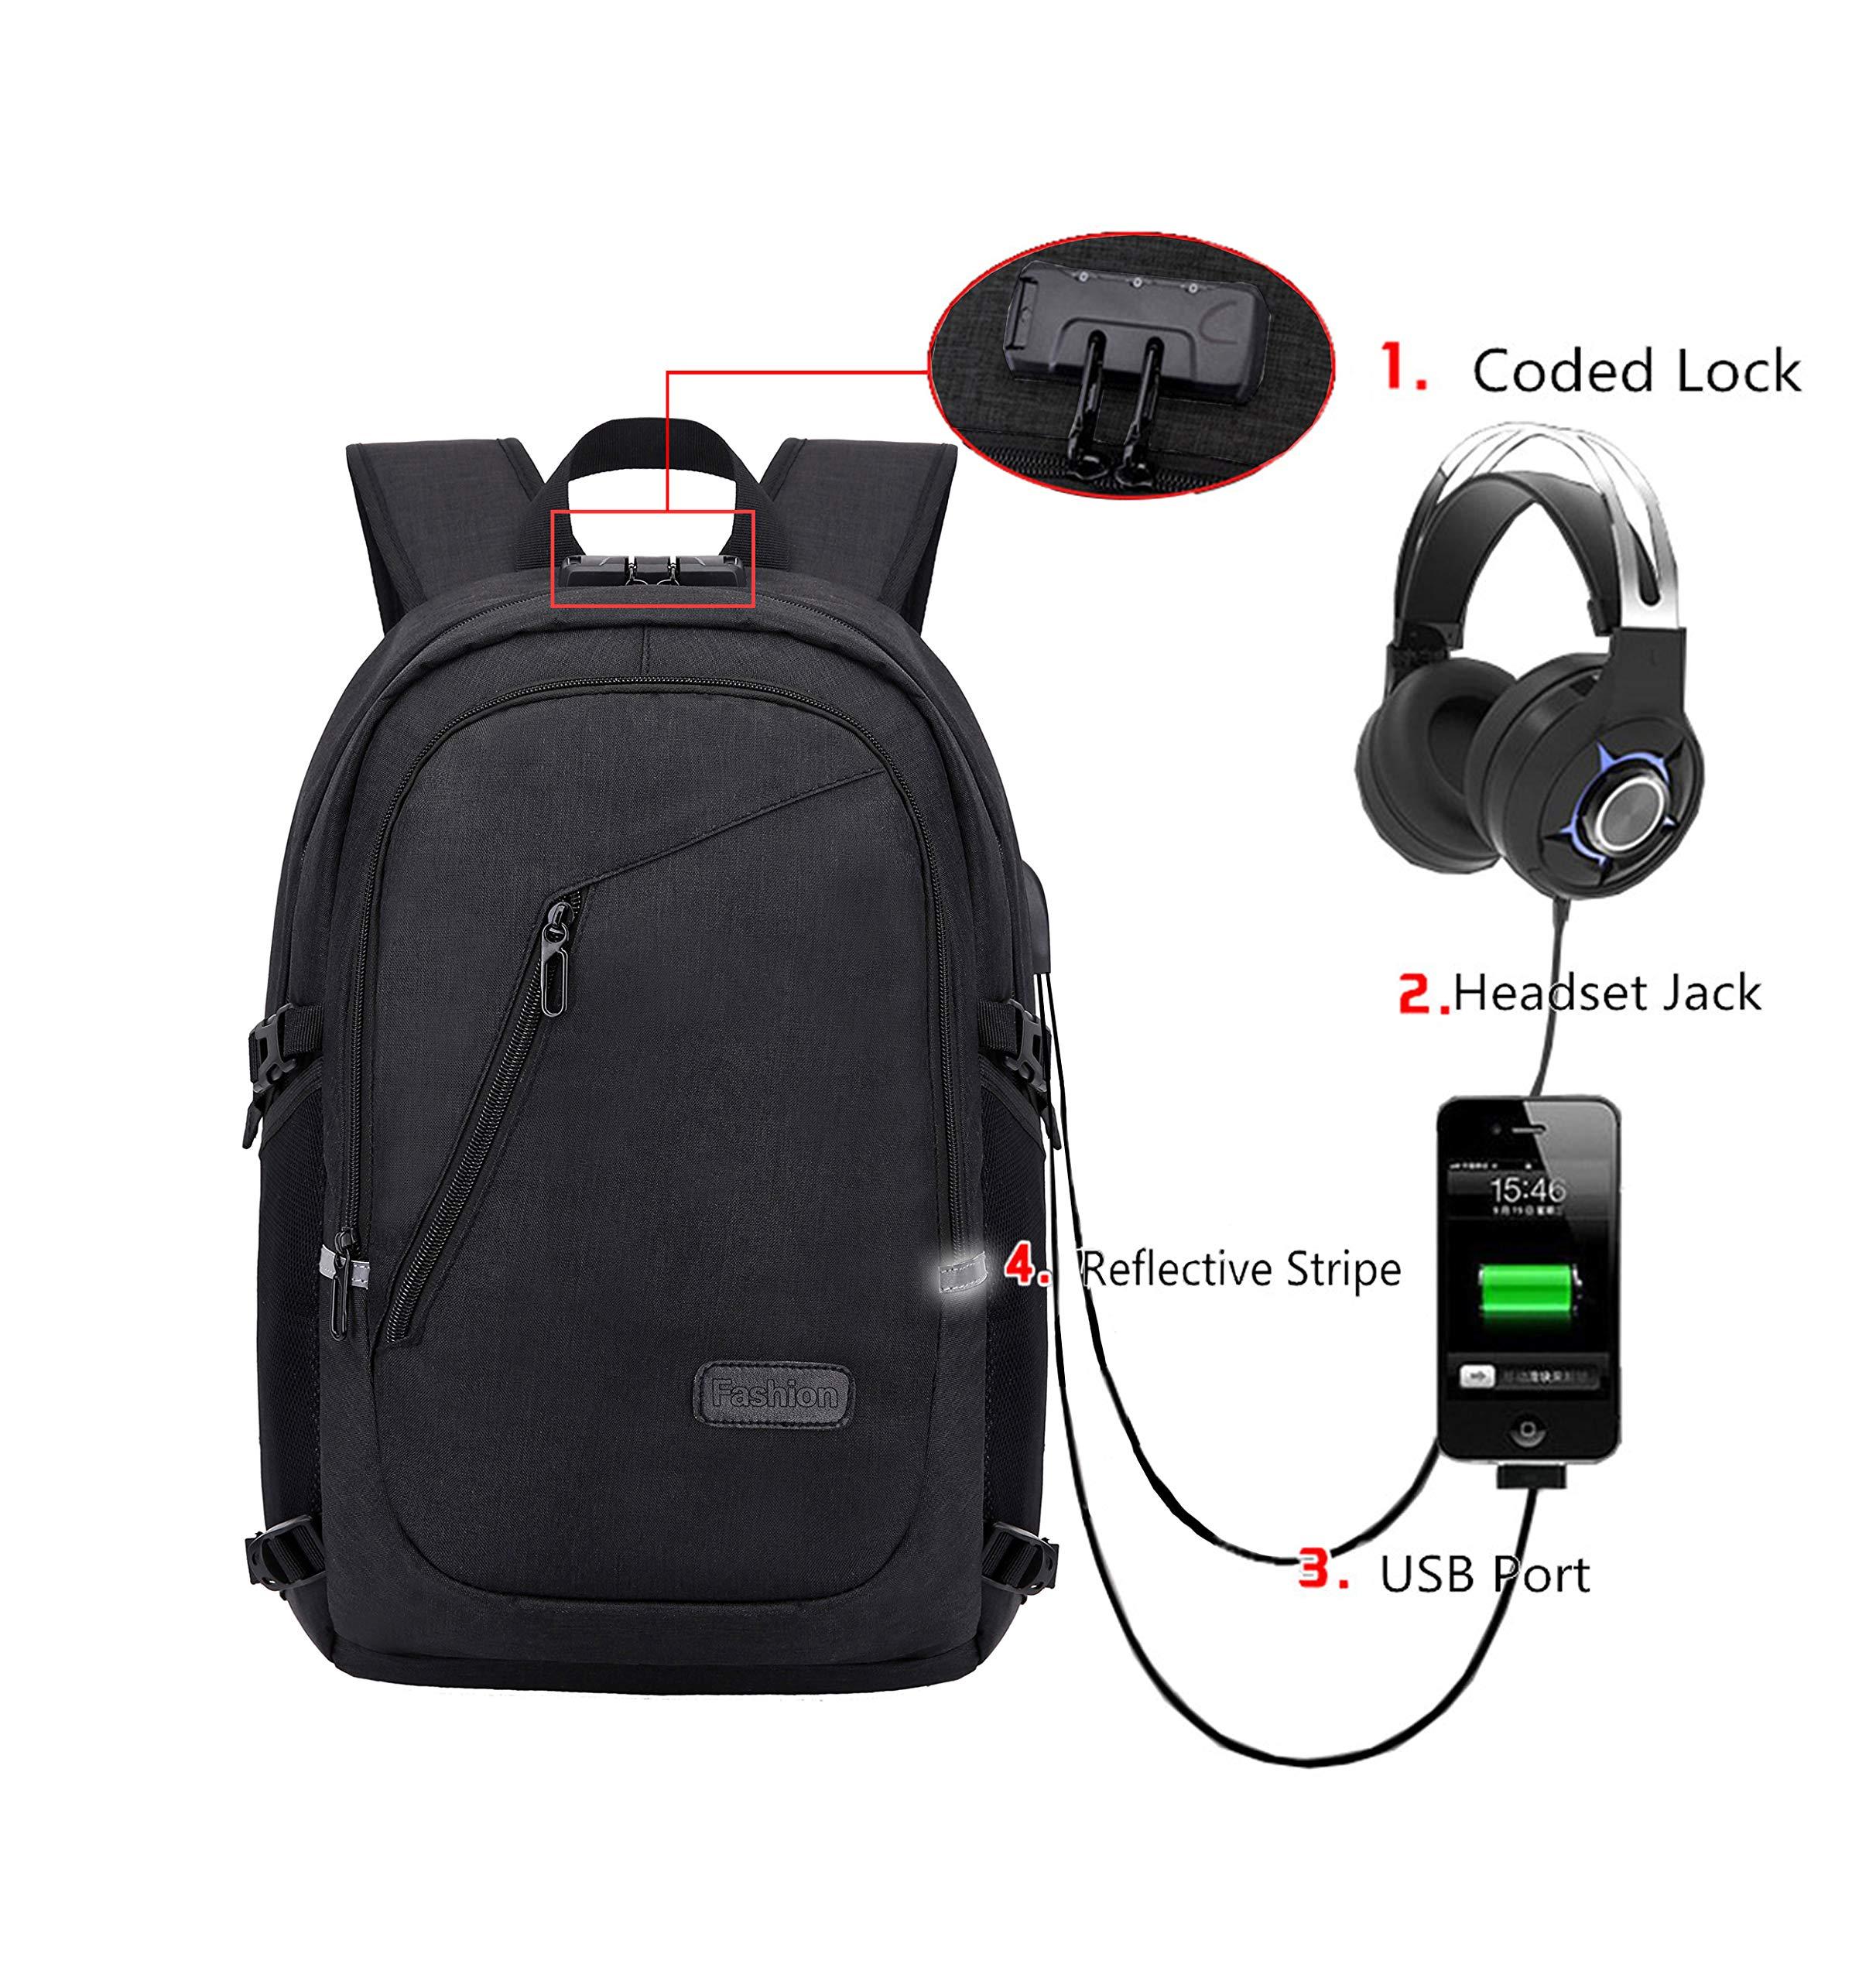 Itopfox Travel Laptop Compartment Backpack USB/Headphone Port Rucksack Computer Bag Anti-Thief Code Lock 17'' Waterproof Canvas Backpack